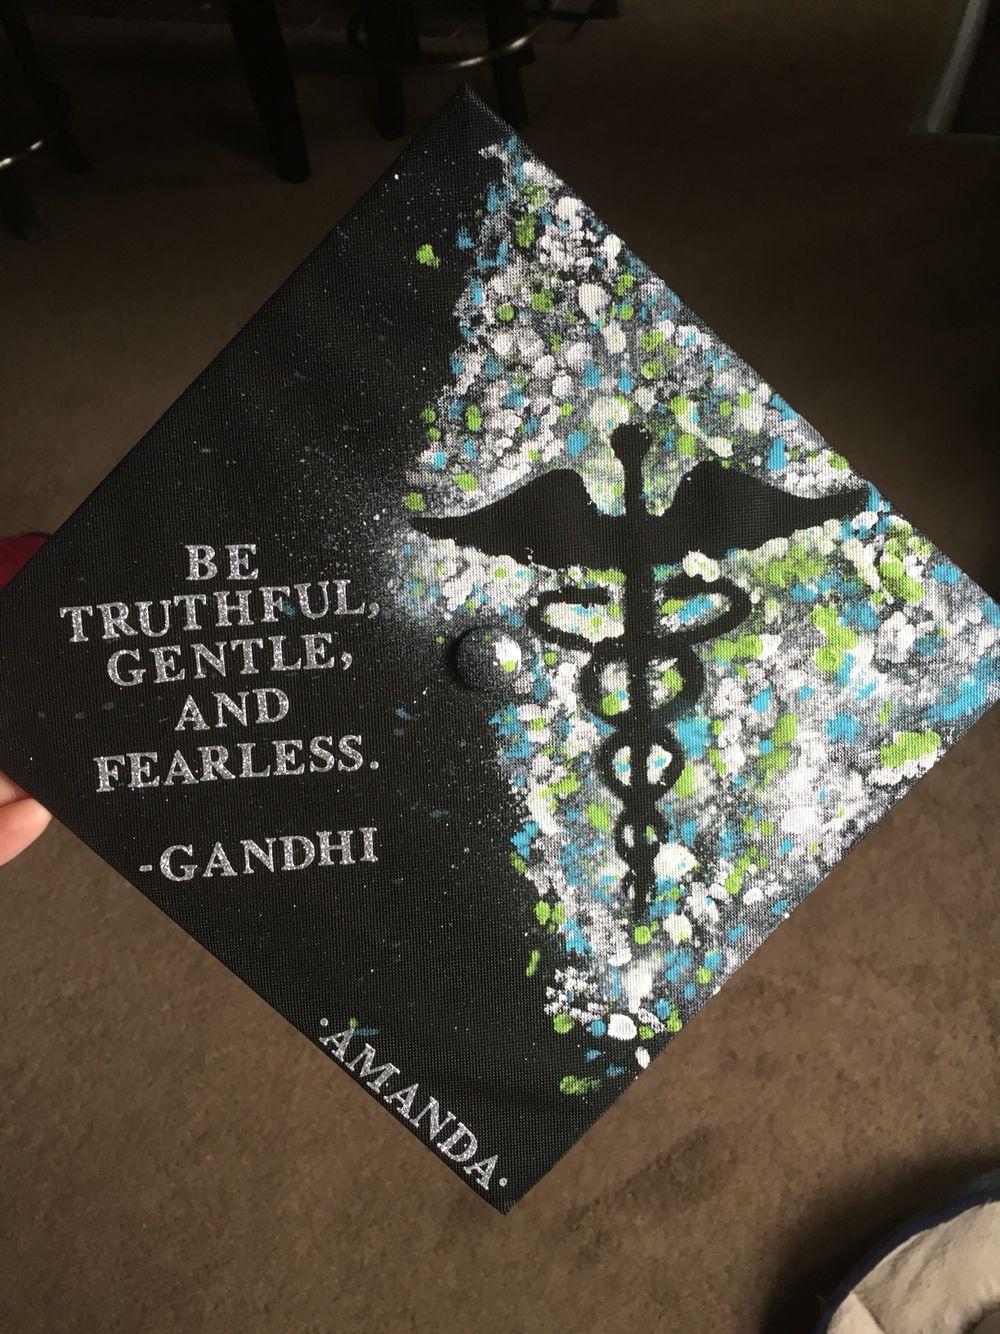 My Nursing Graduation Cap Decorated With A Splatter Paint Caduceus